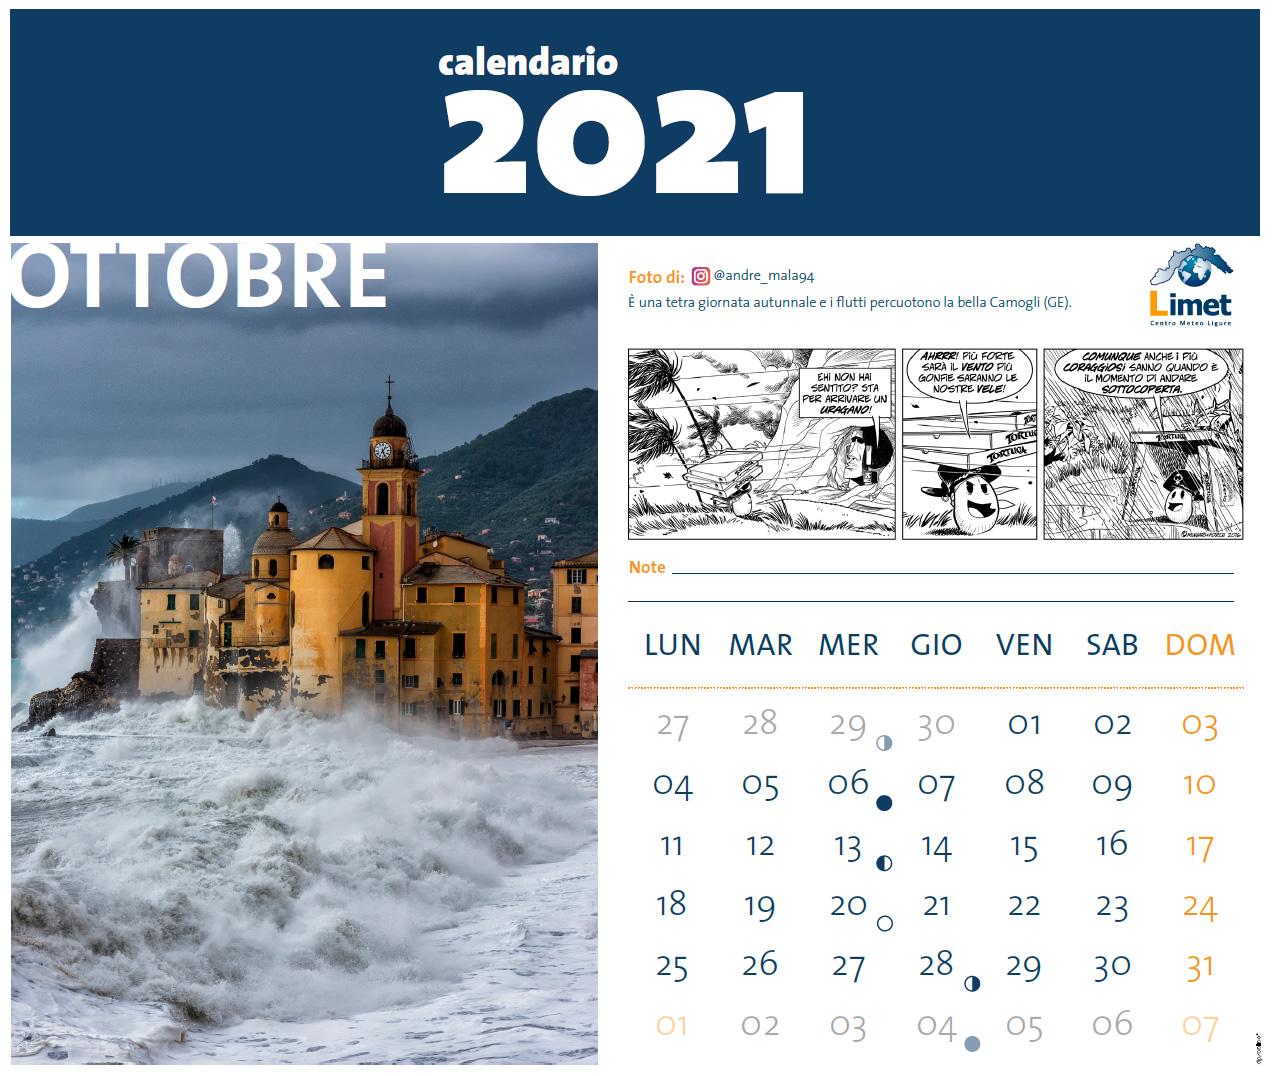 Raccolta Fondi Calendario 2021